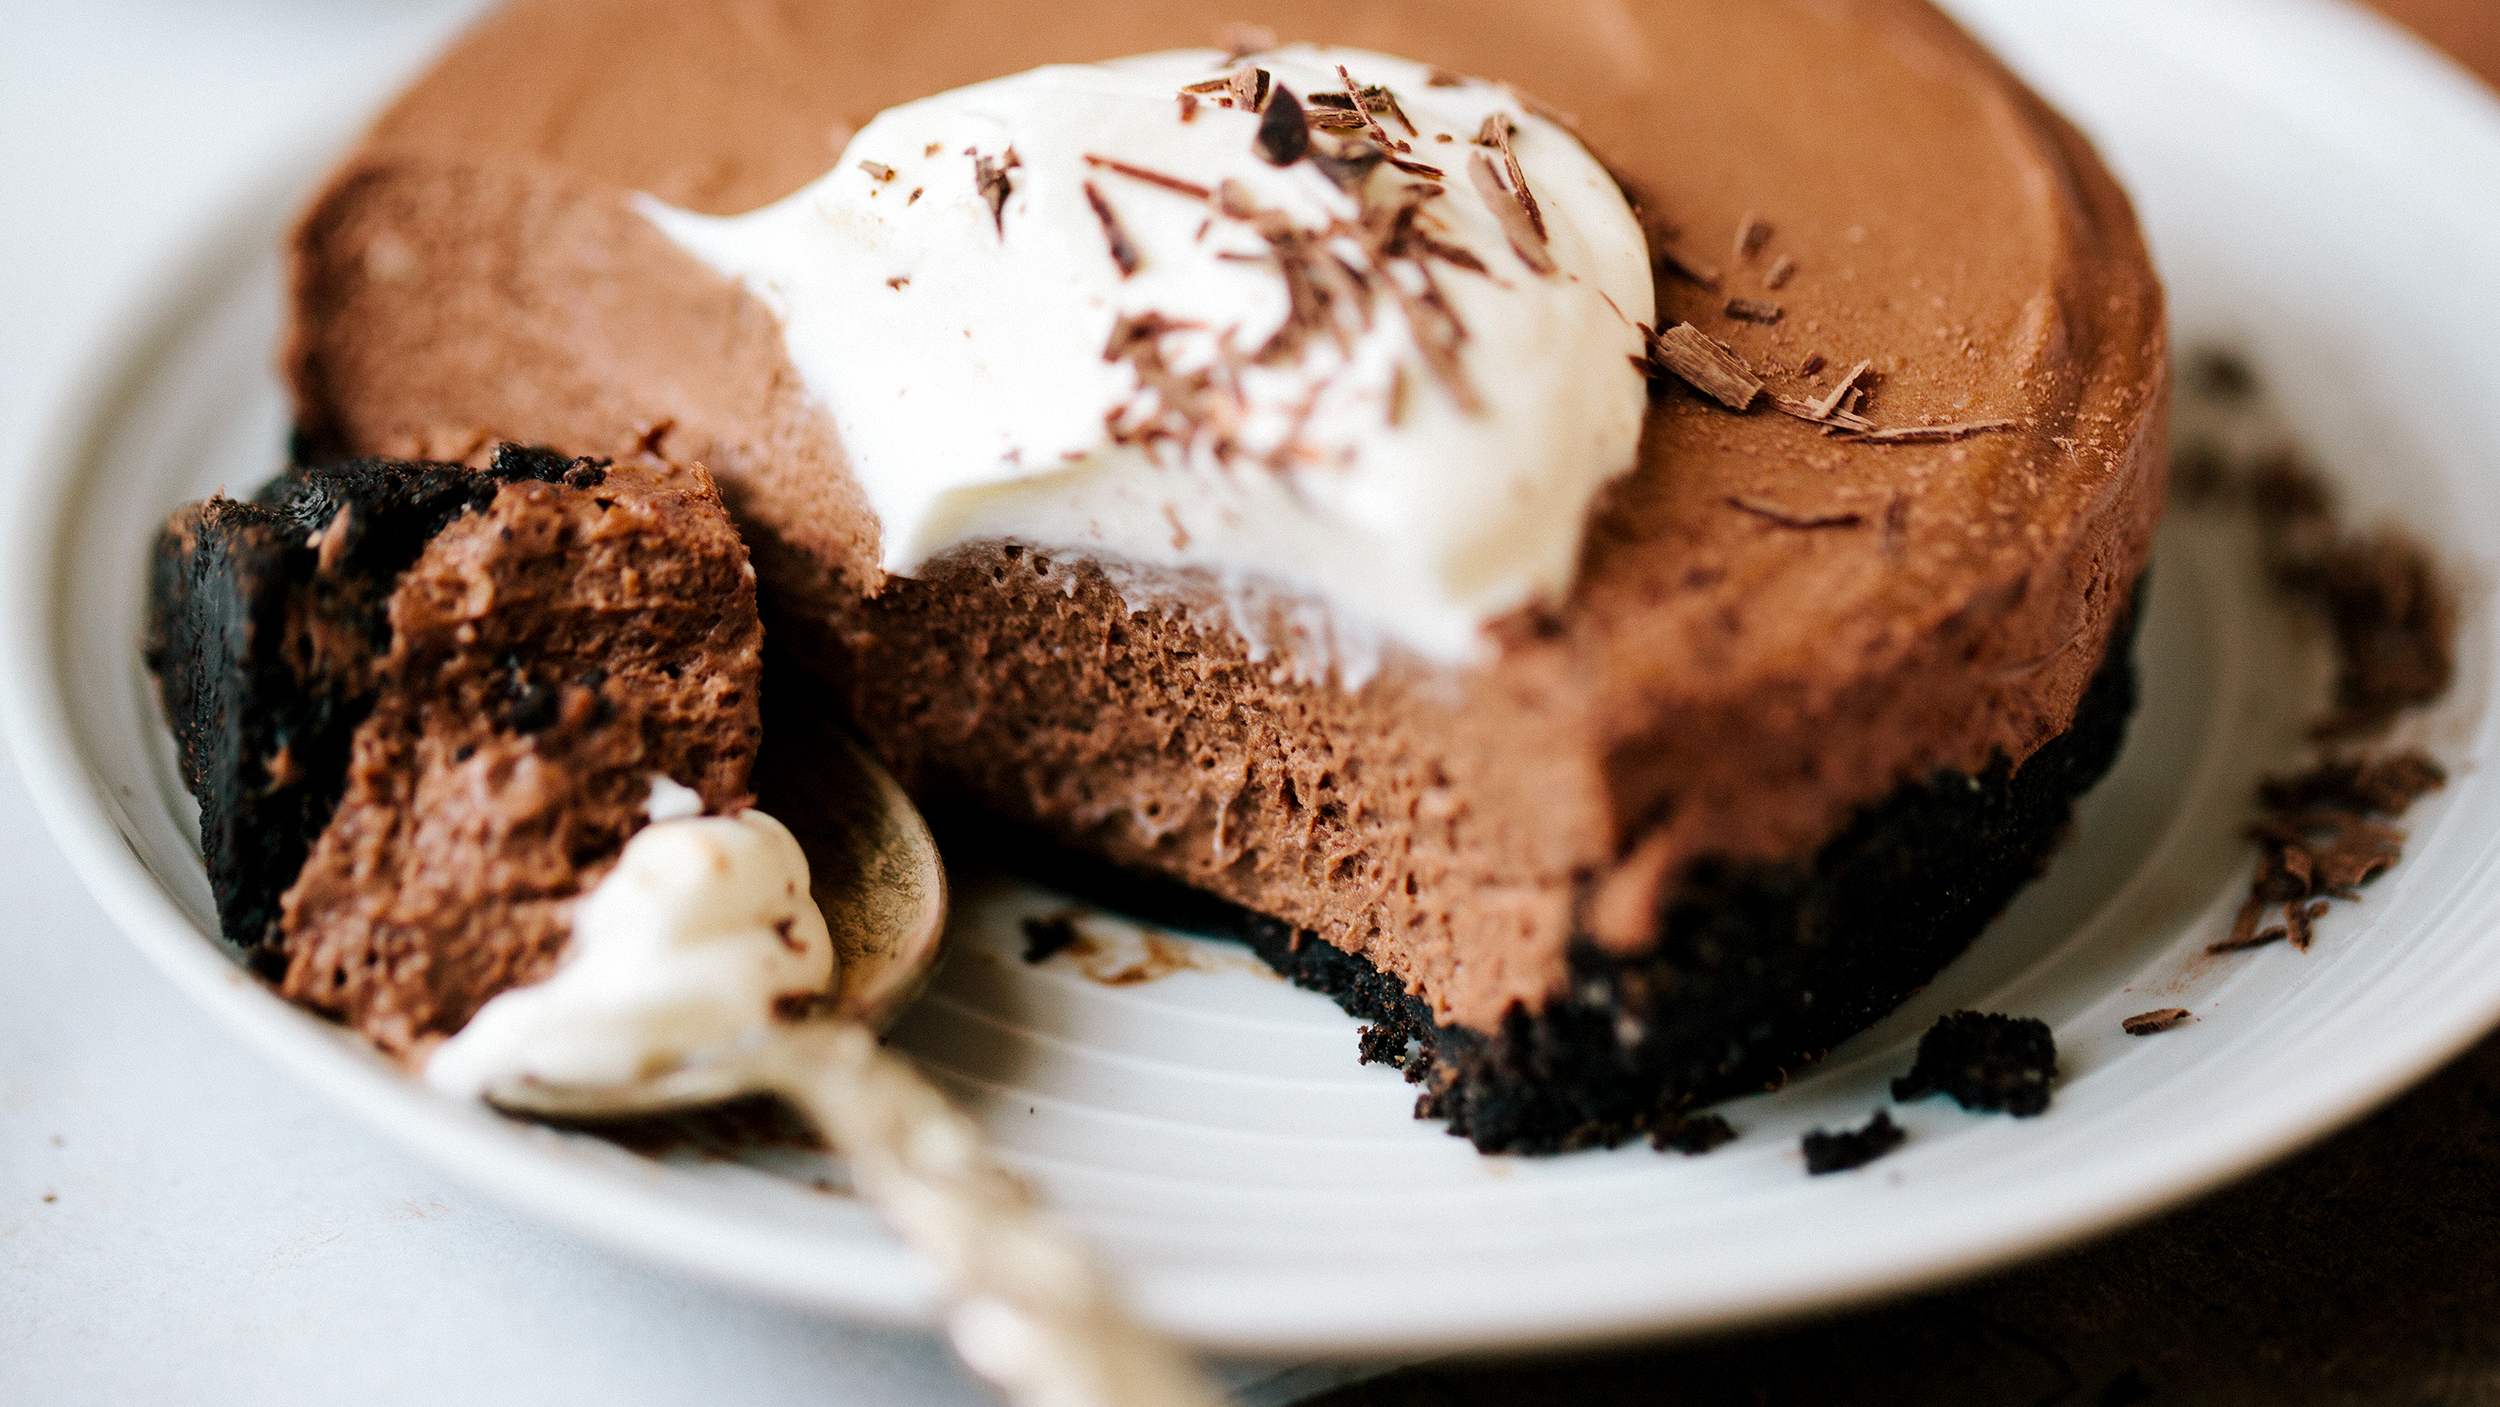 How To Make Italian Chocolate Ice Cream